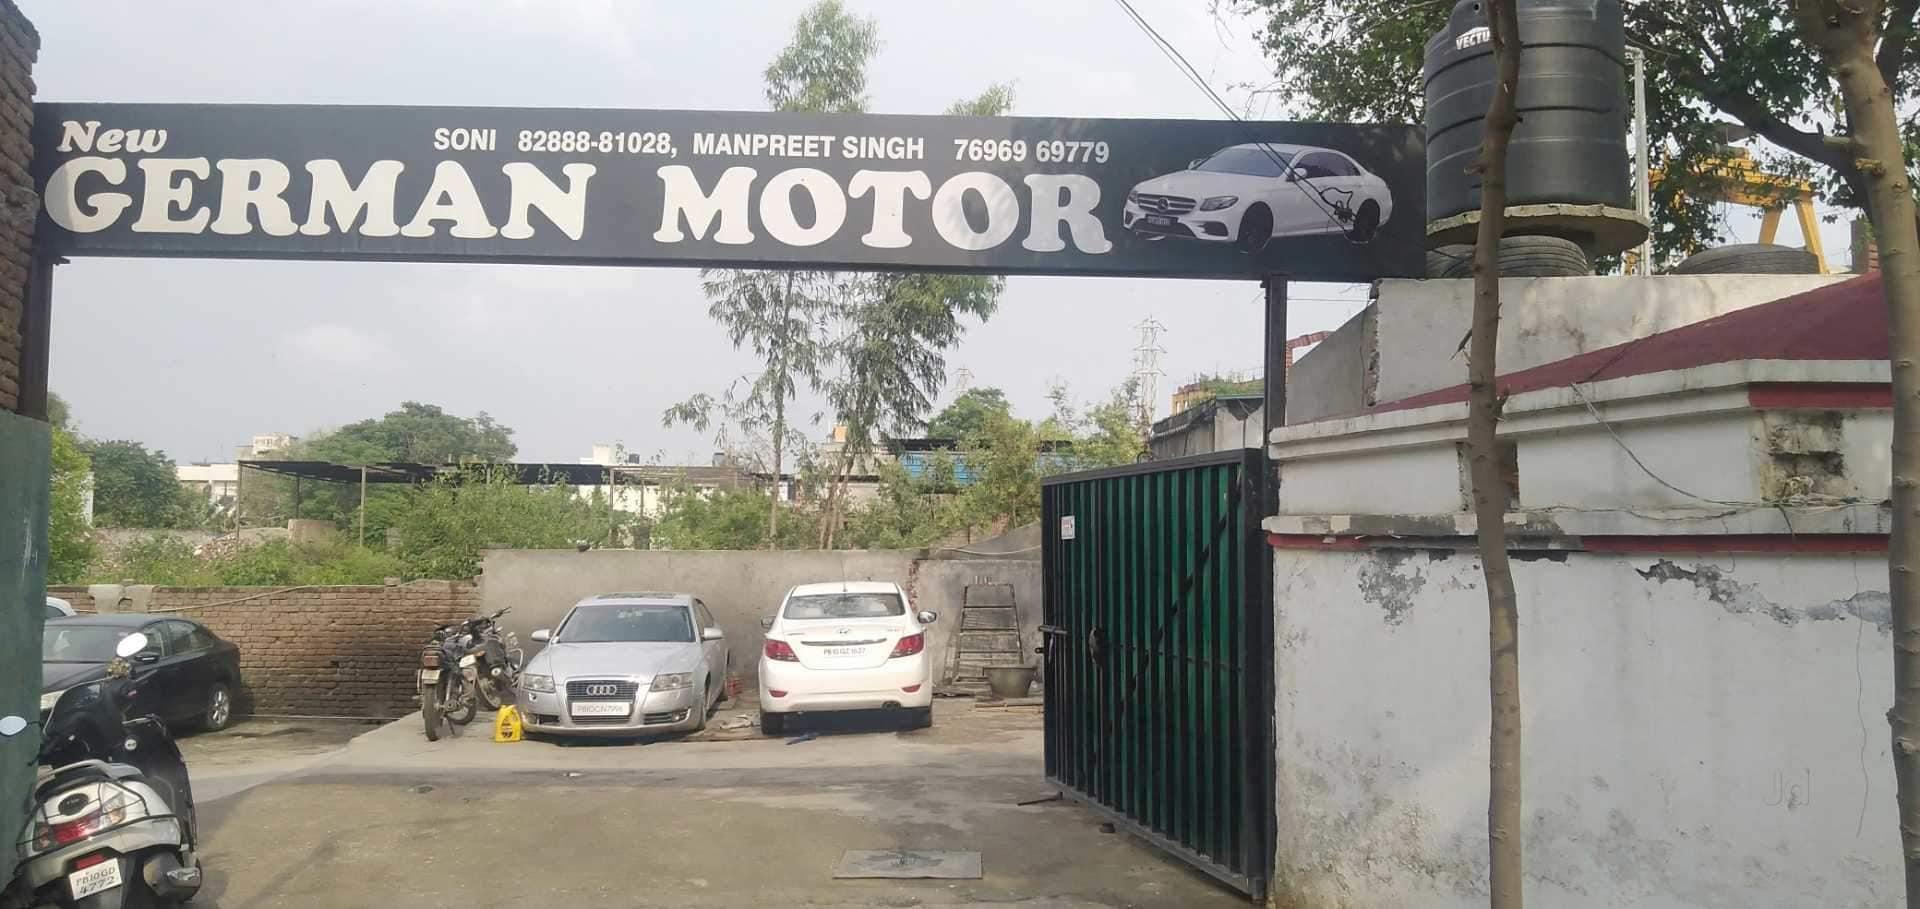 Top 100 Car Repair & Services in Ludhiana - Best Car Service